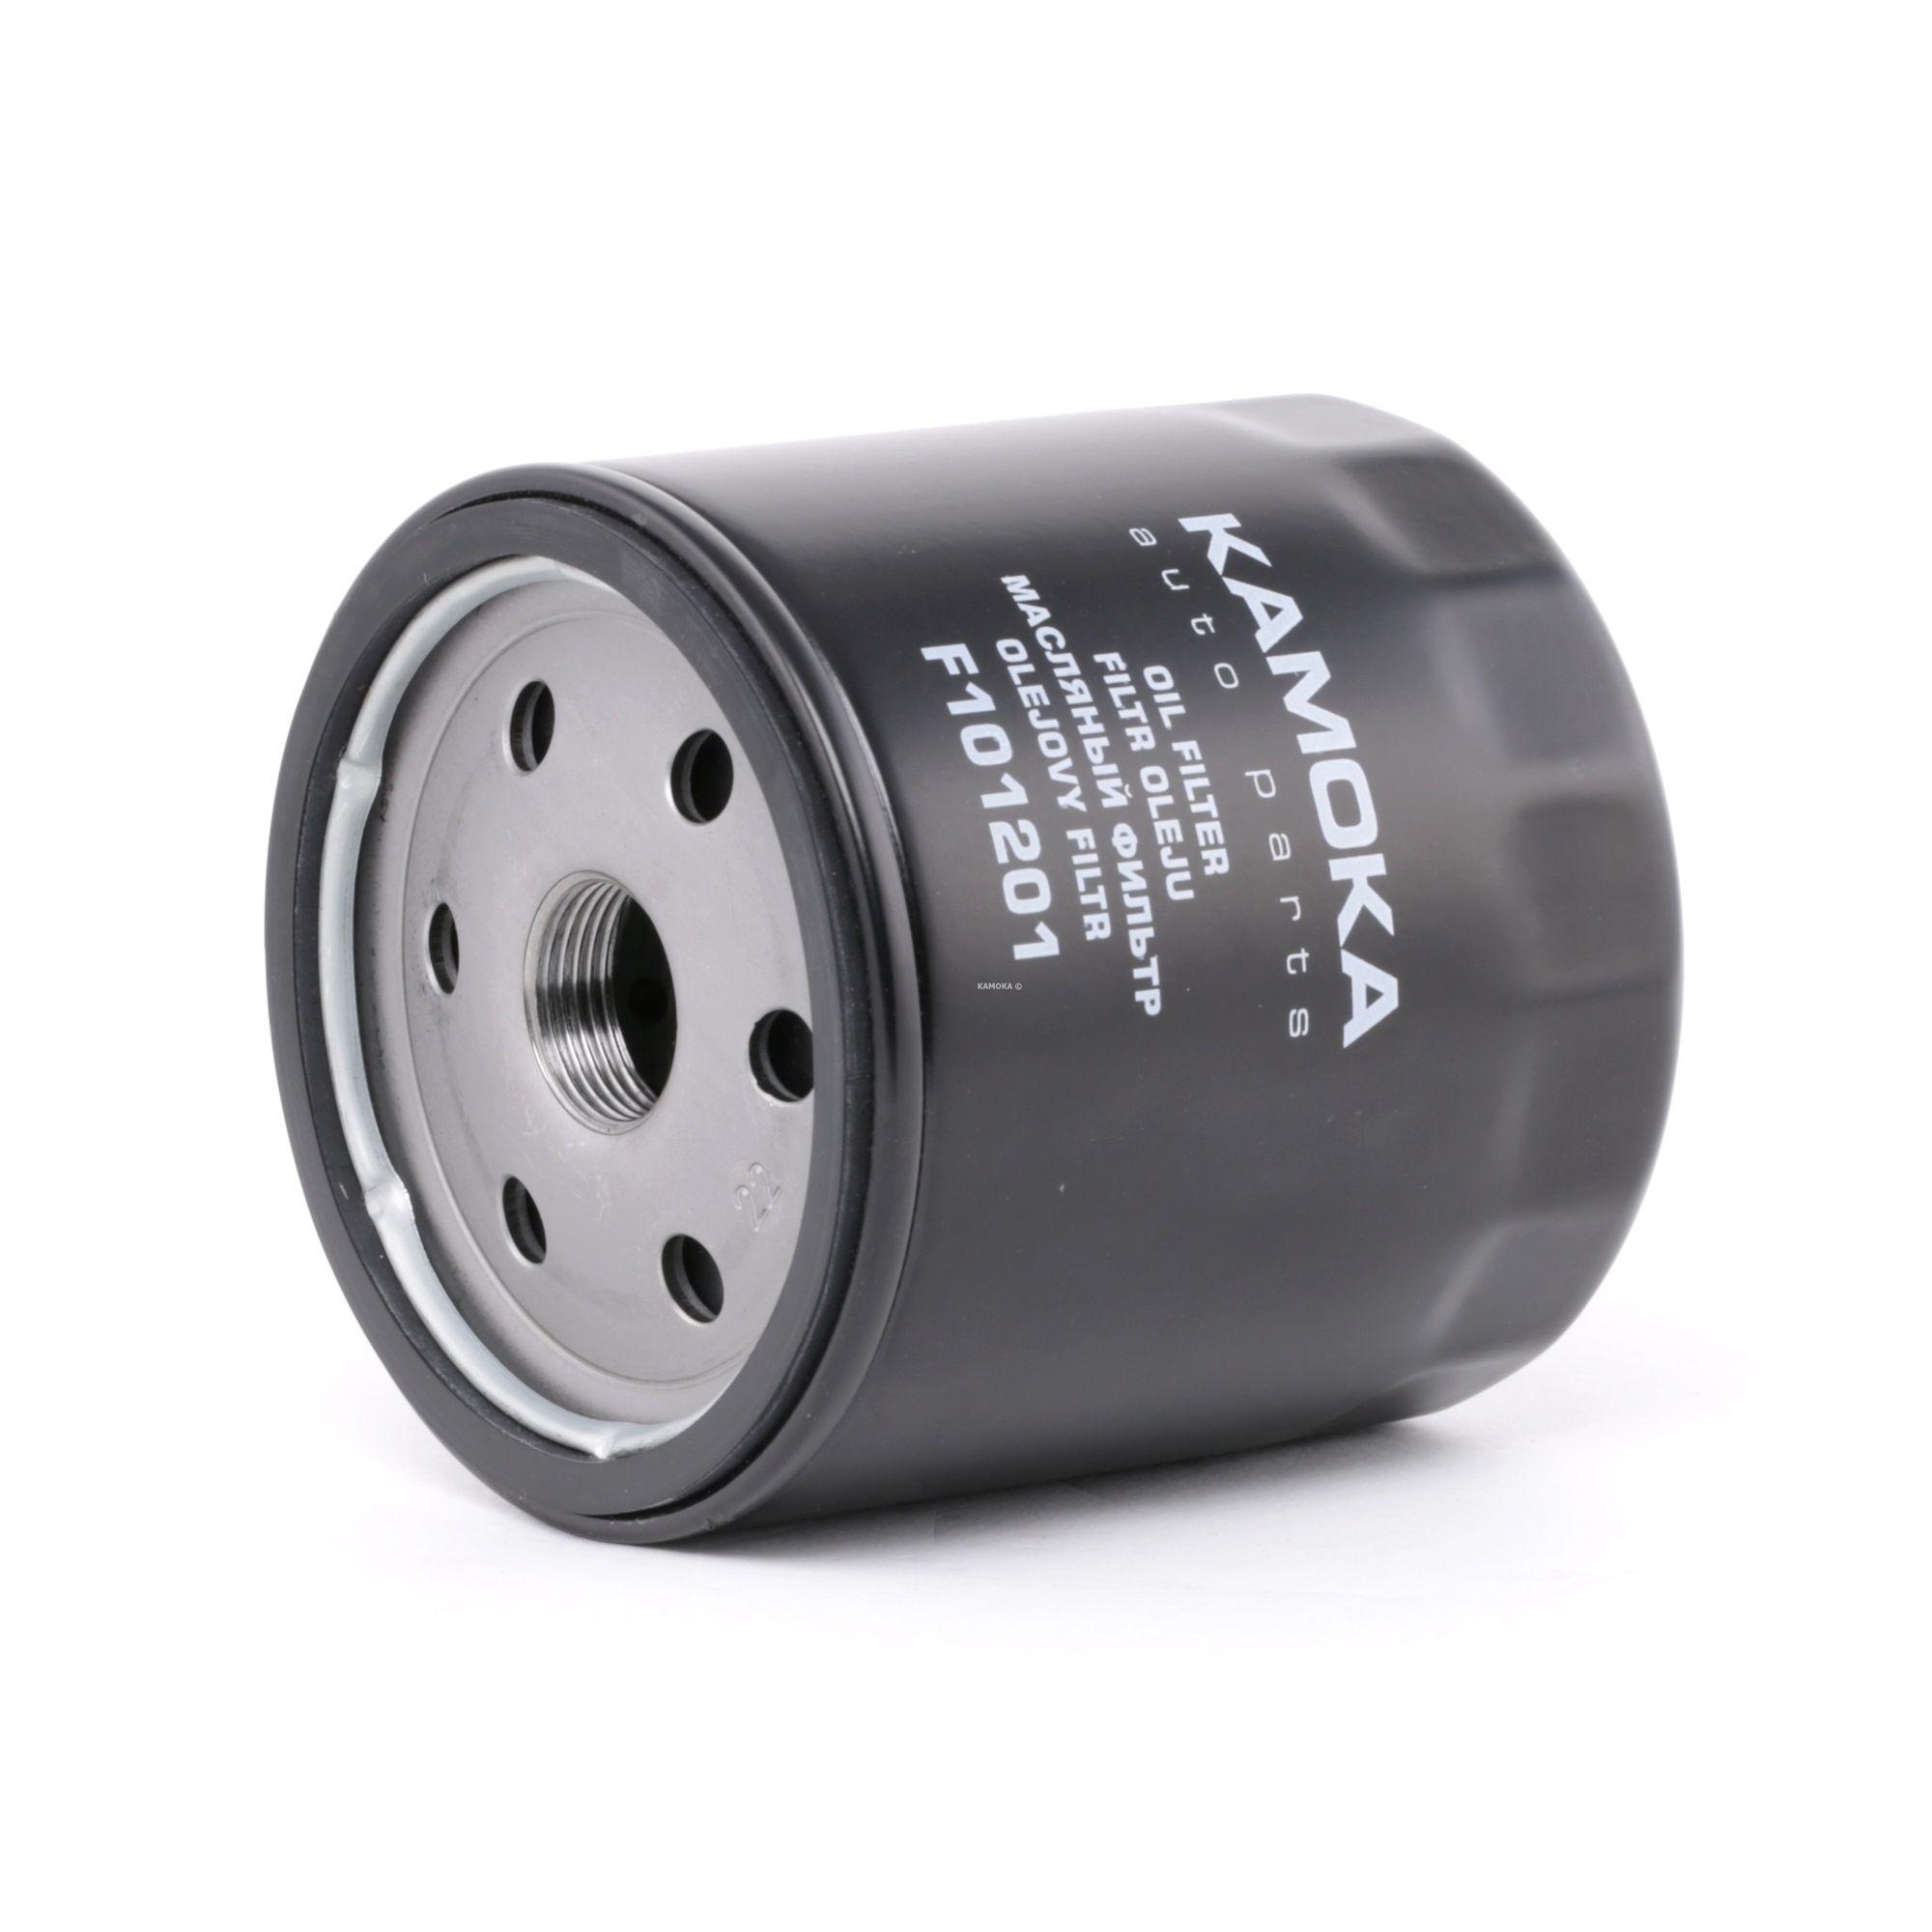 F101201 KAMOKA Anschraubfilter, mit einem Rücklaufsperrventil Ø: 96mm, Höhe: 97mm Ölfilter F101201 günstig kaufen